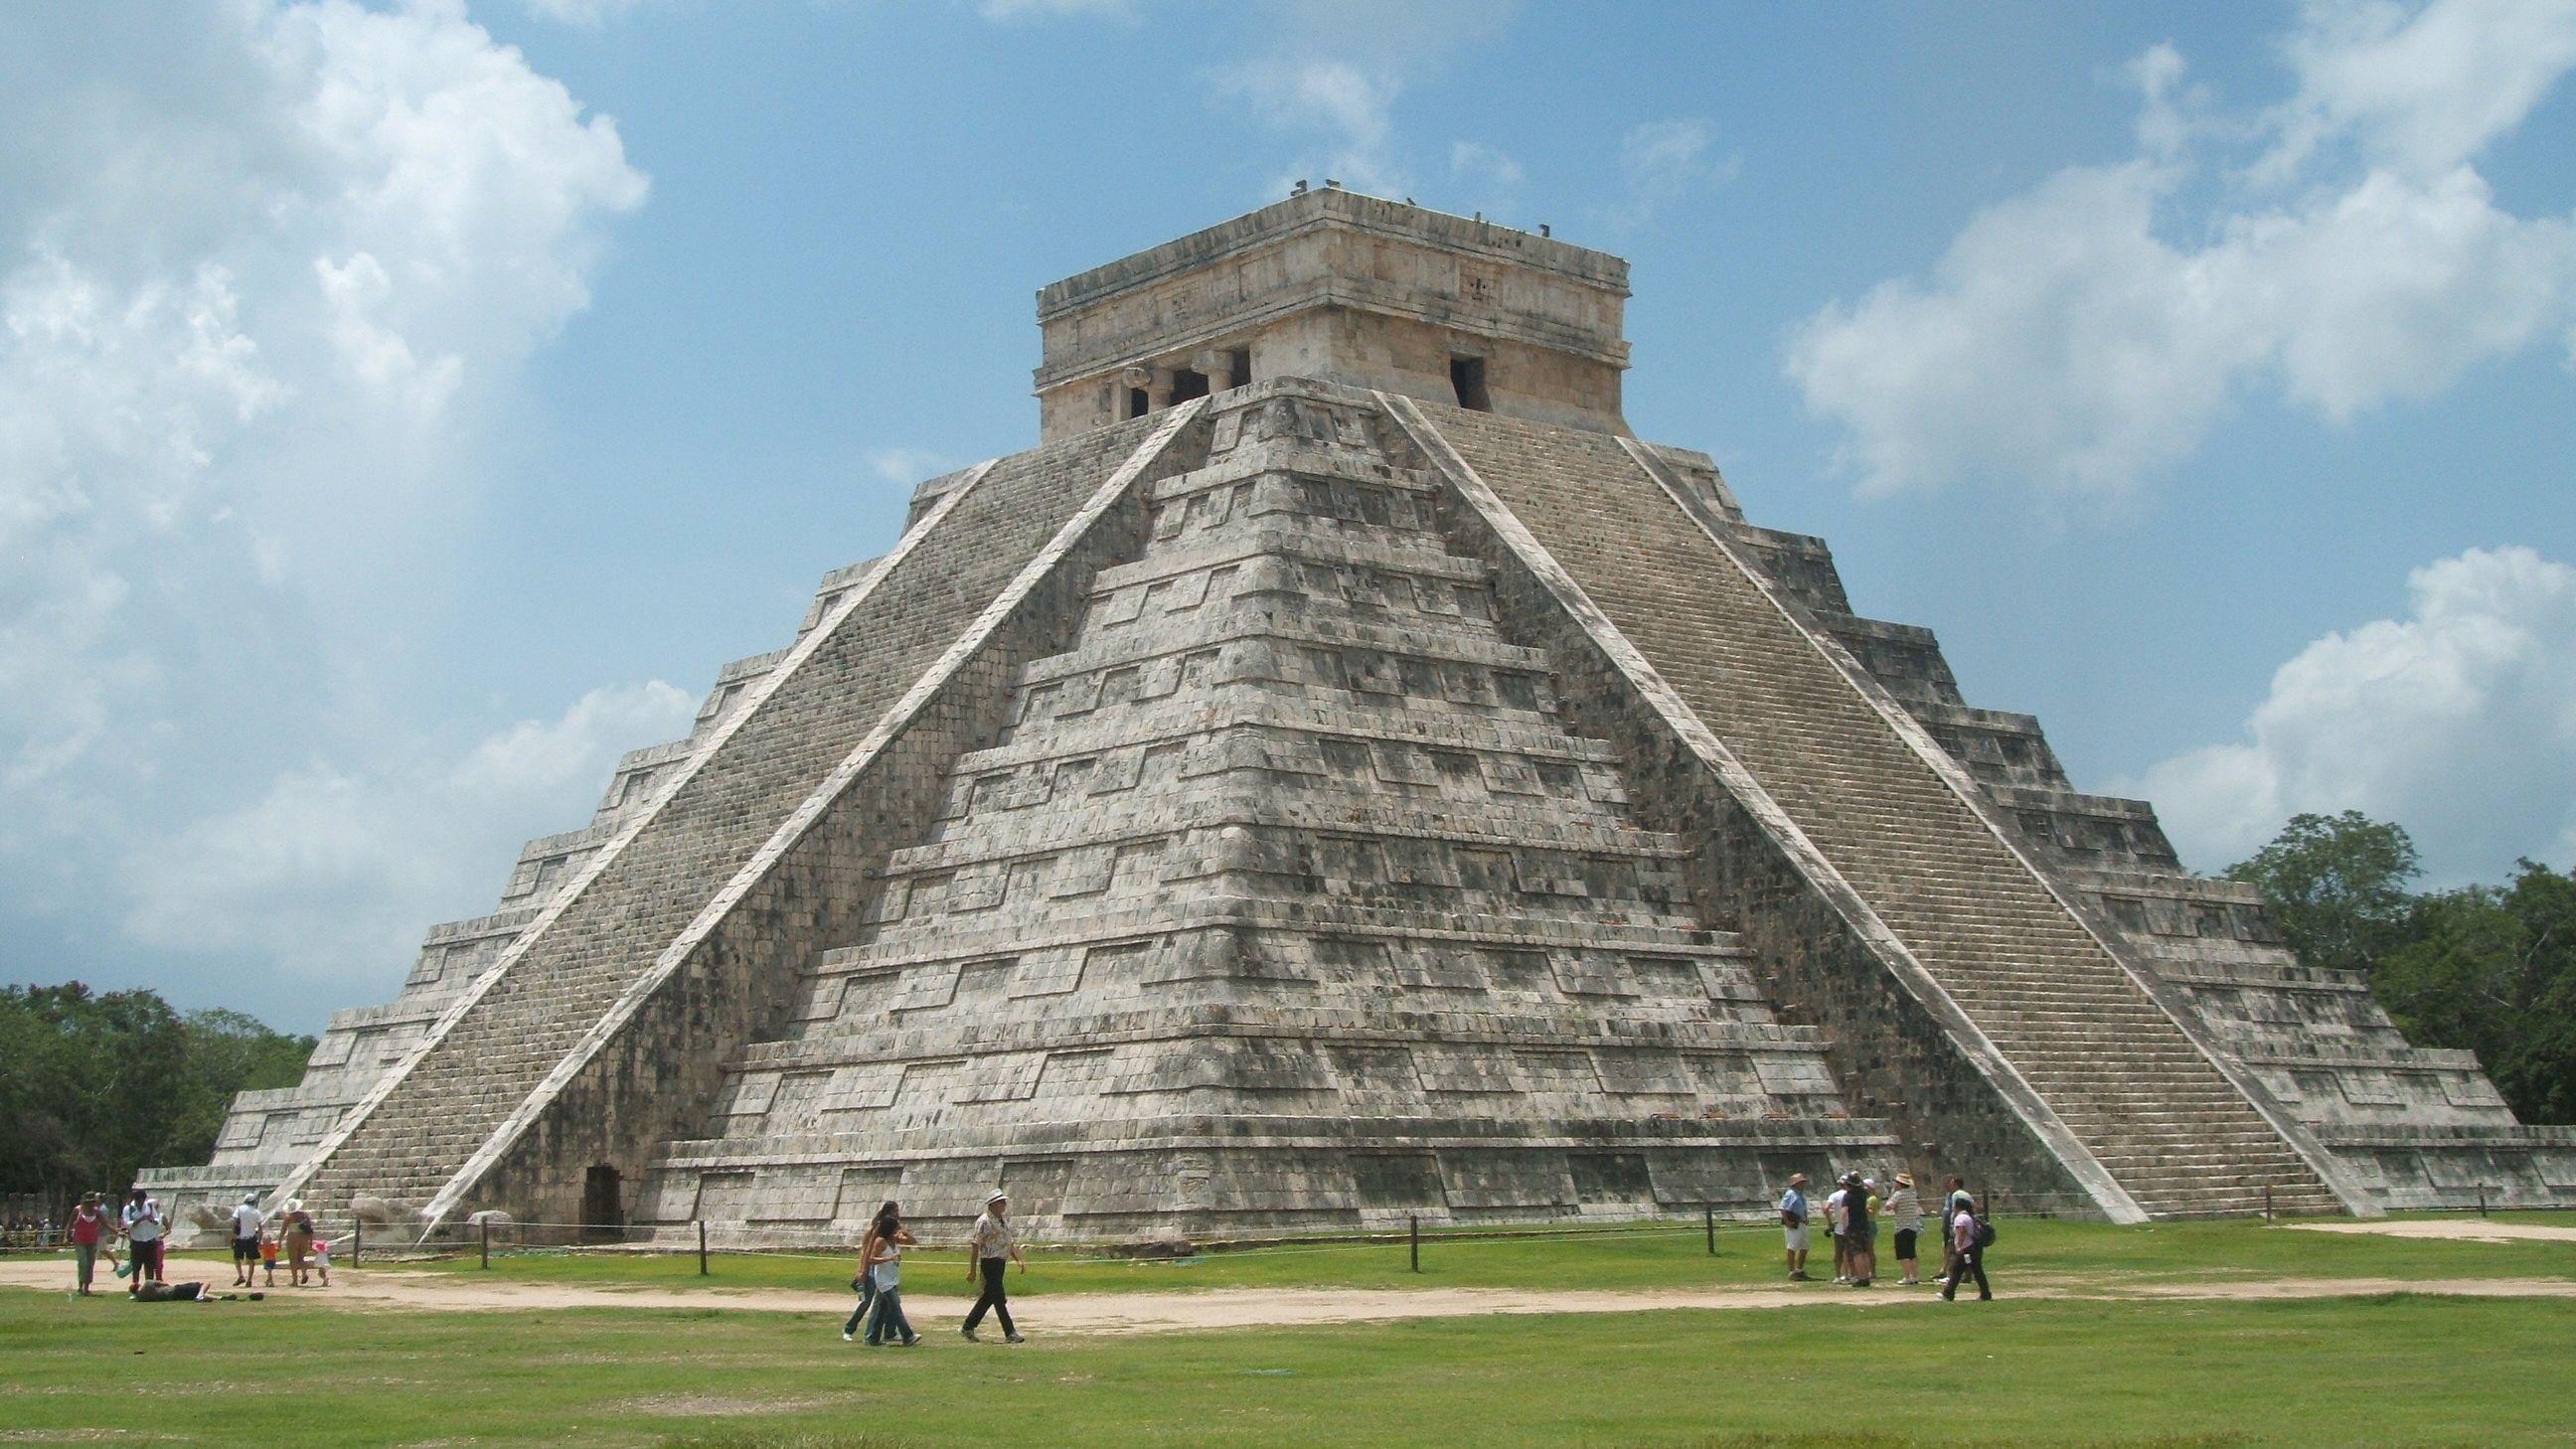 A Mexican pyramid